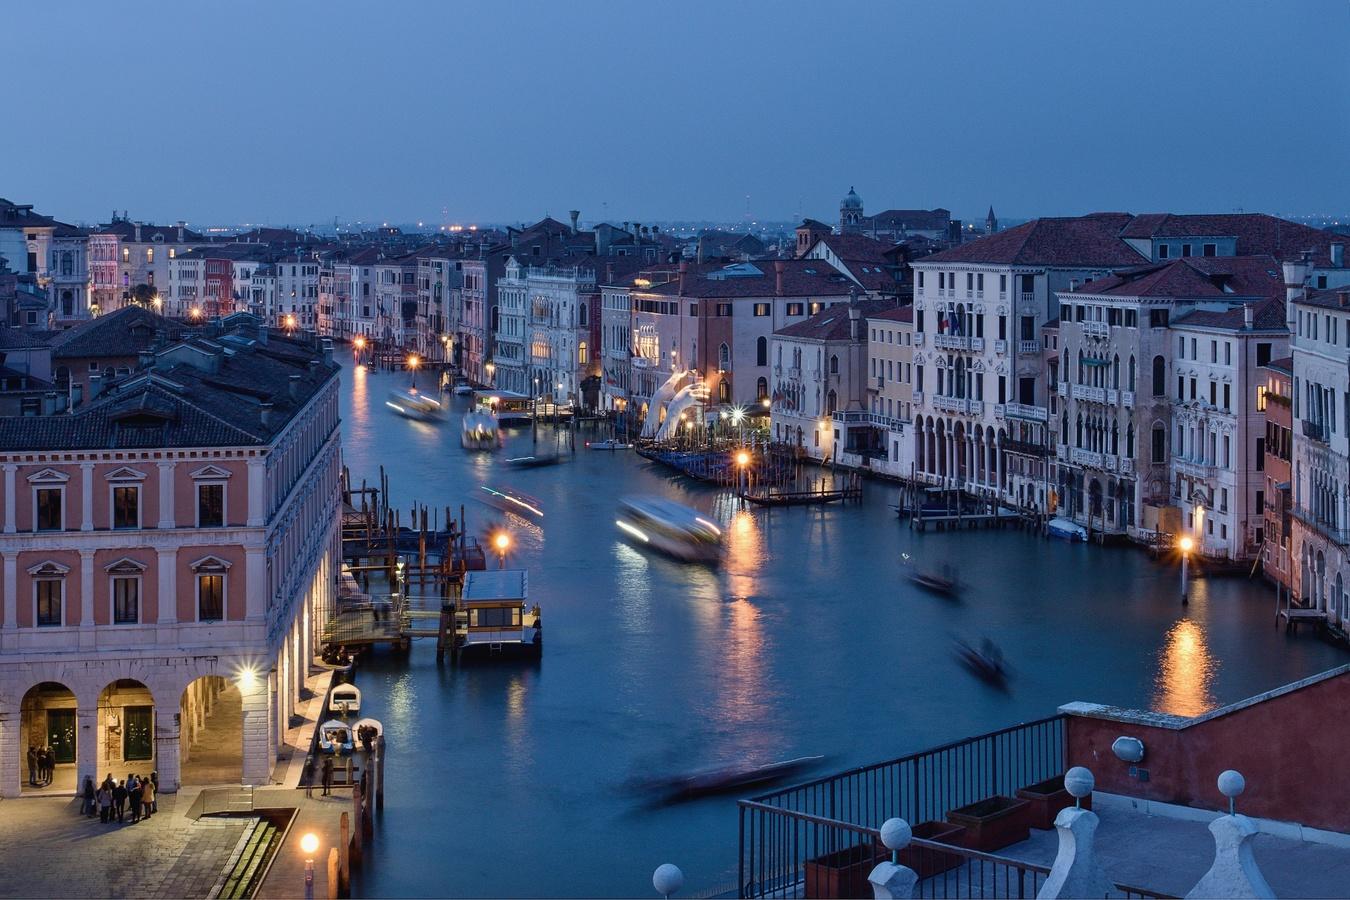 Canal Grande - Benátky